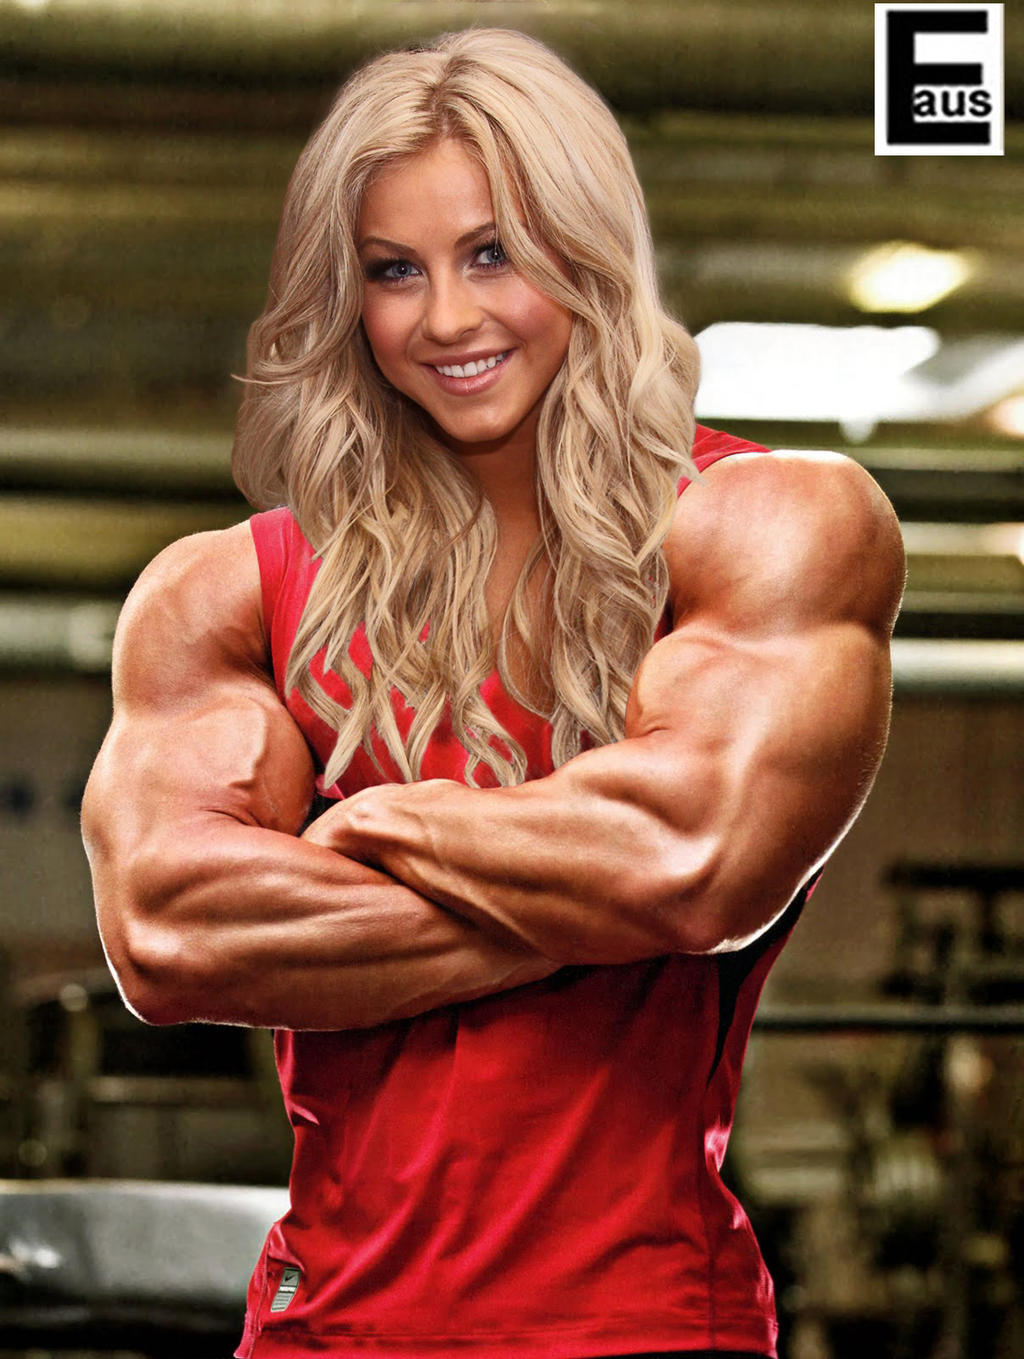 Huge Female Bodybuilder by edinaus